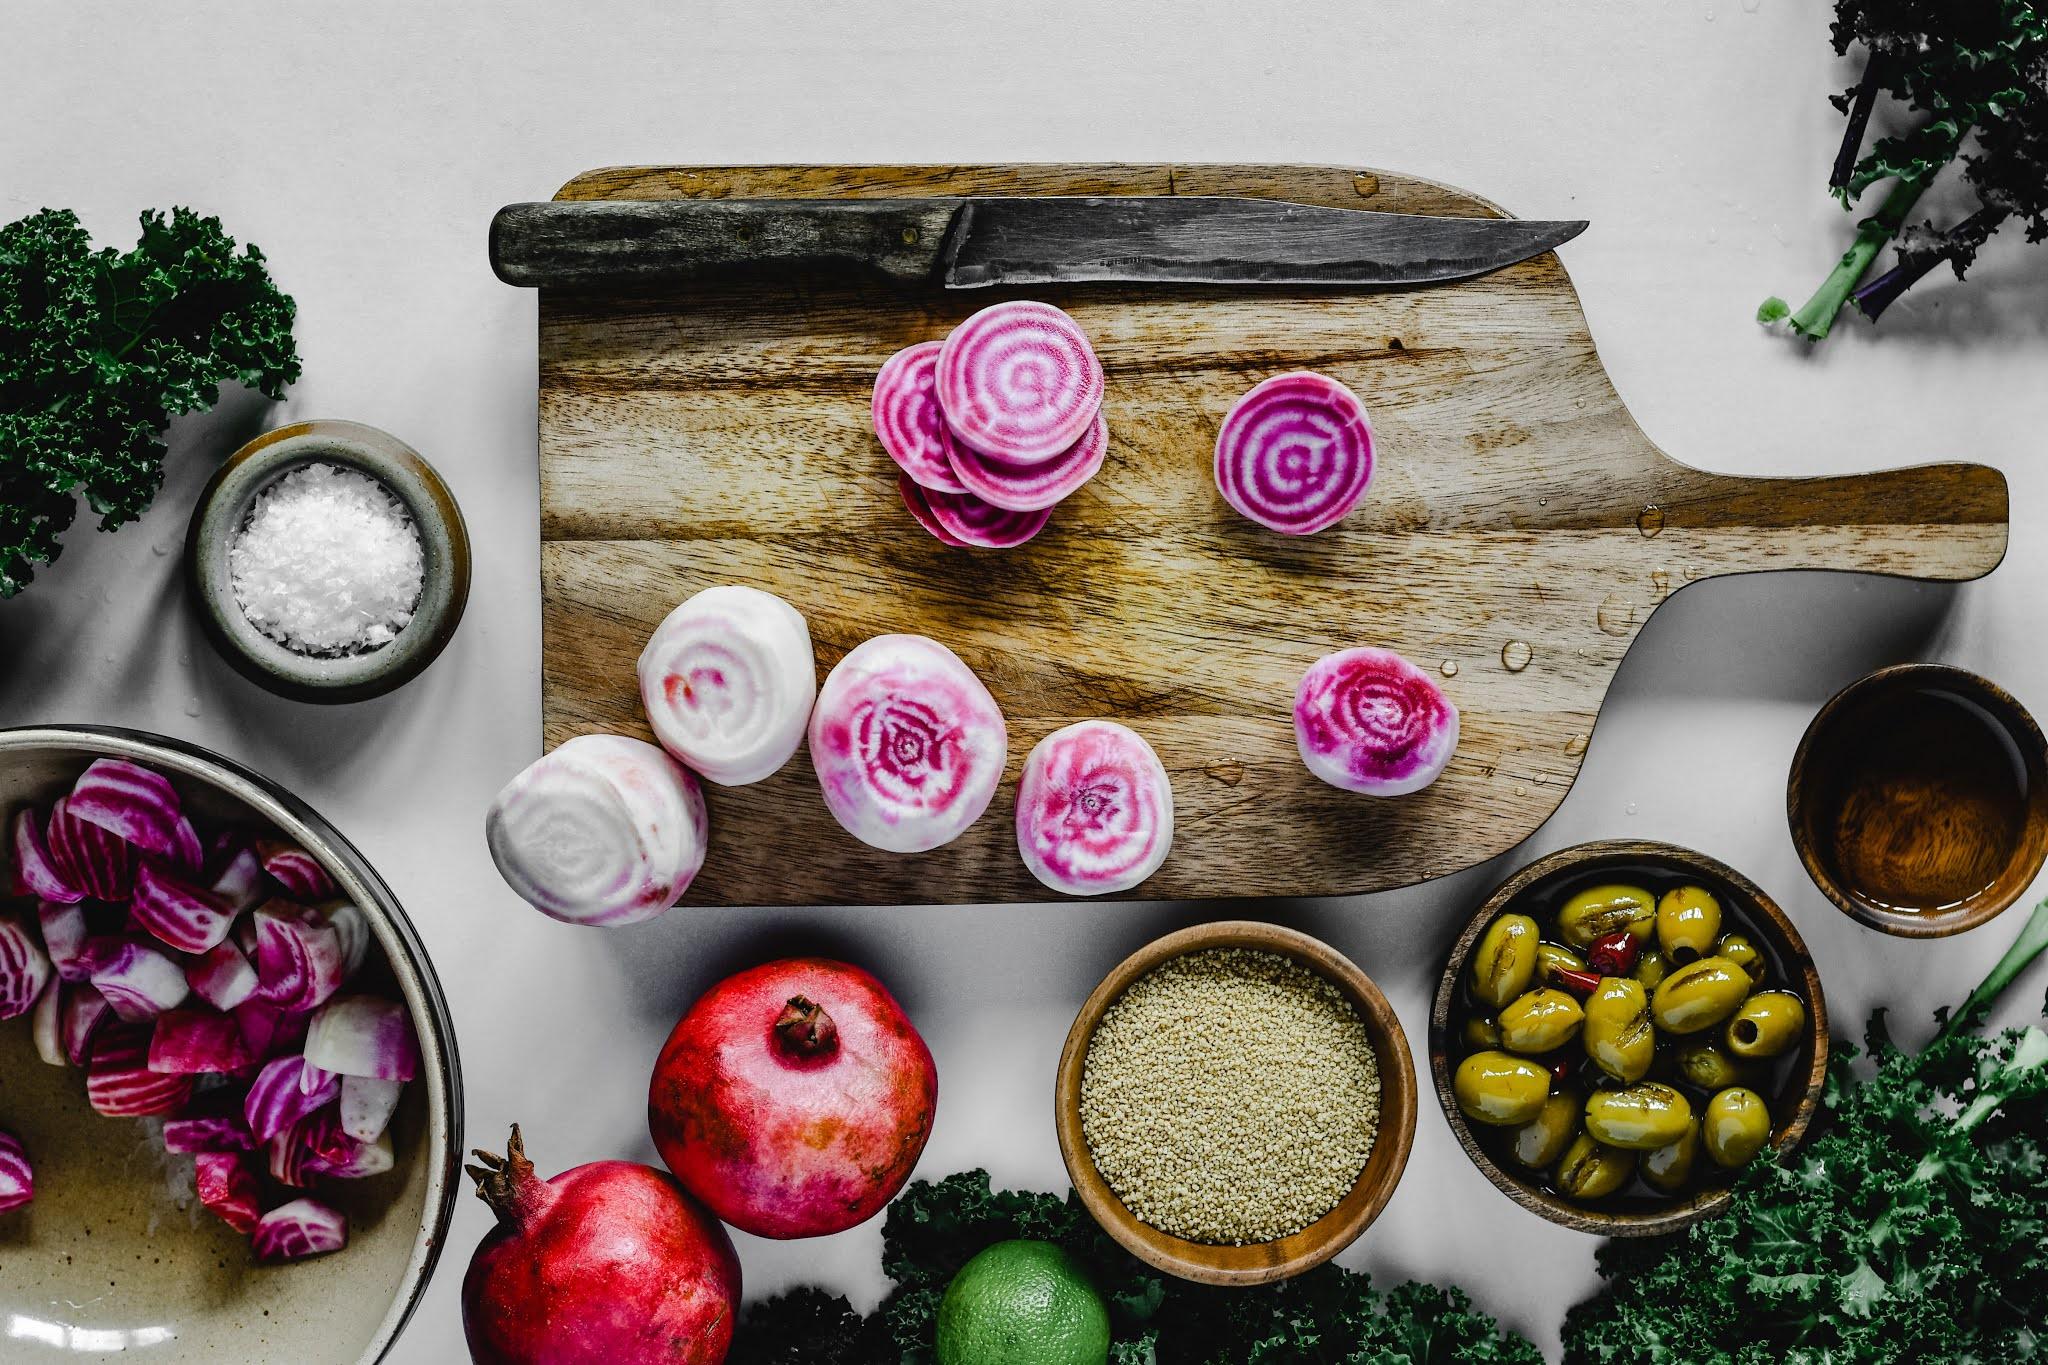 Veggies and chopping board